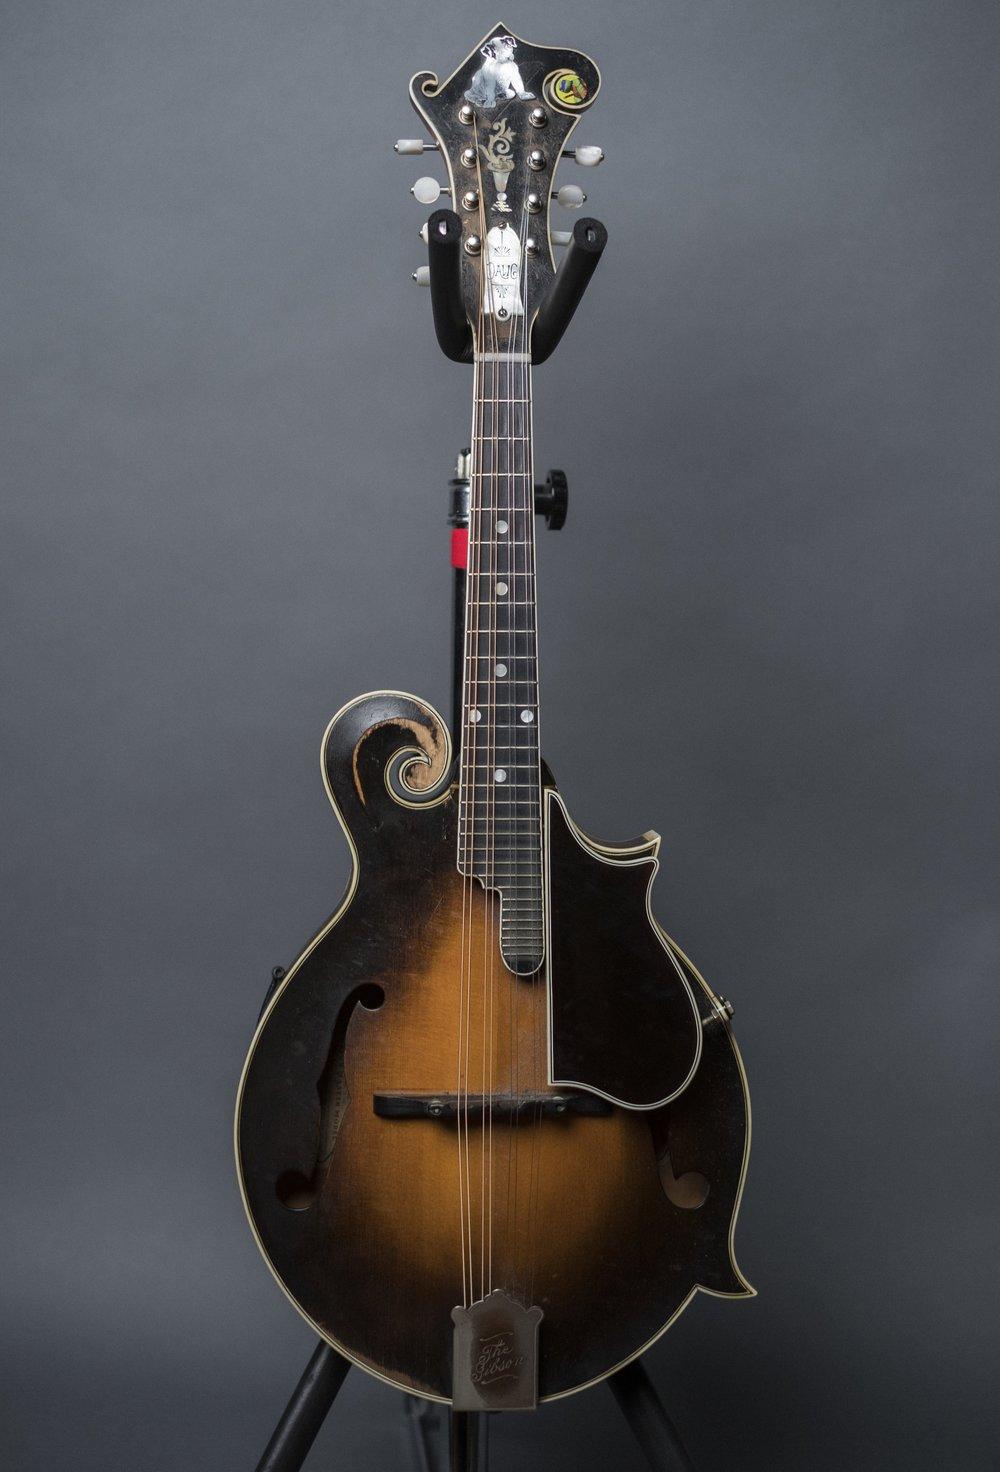 David Grisman's 1922 Gibson Loar F5